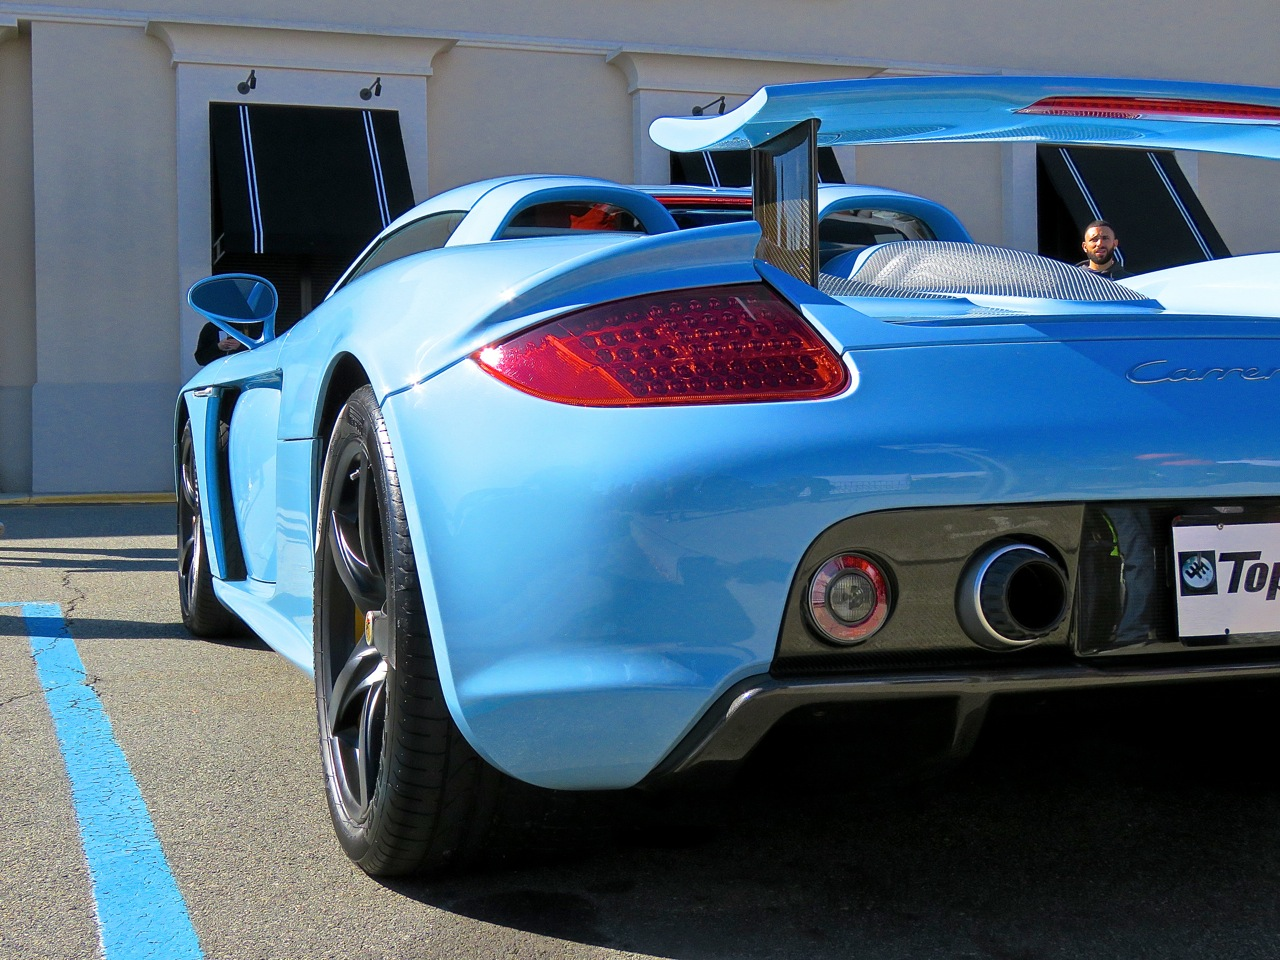 Baby Blue Porsche Carrera GT 4